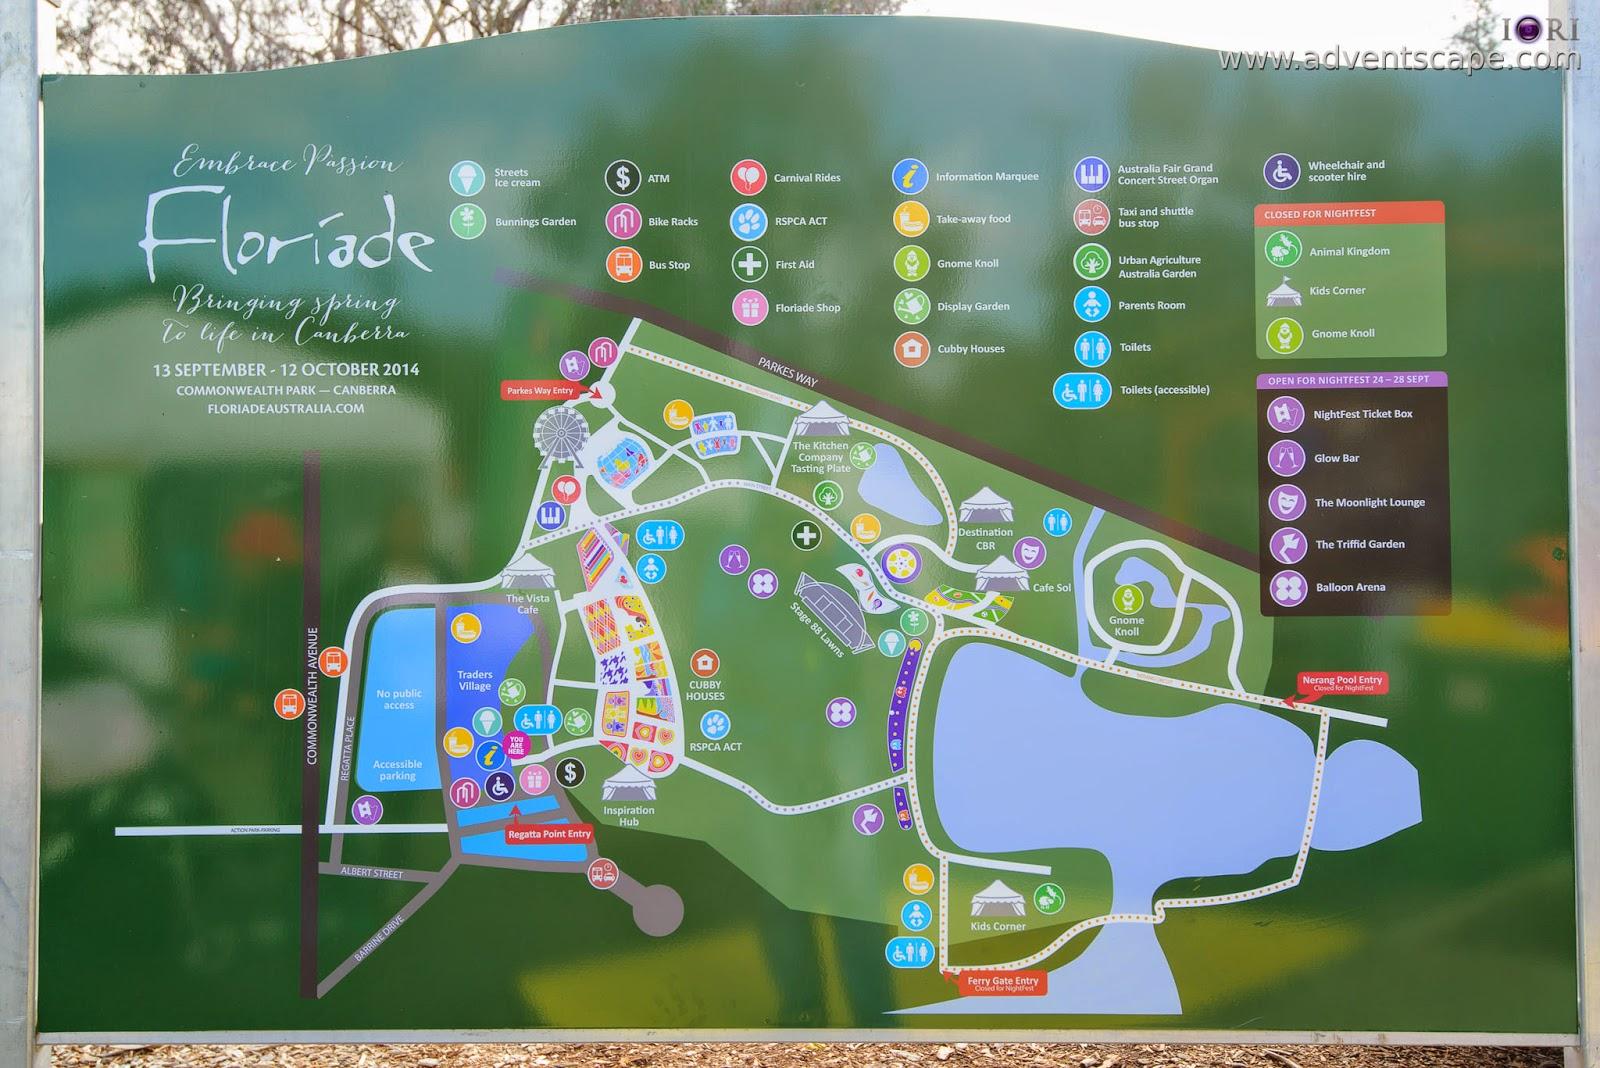 Philip Avellana, iori, advenscape, Floriade, 2014, spring festival, Canberra, ACT, Australian Capital Territory, park, flowers, blossom, map